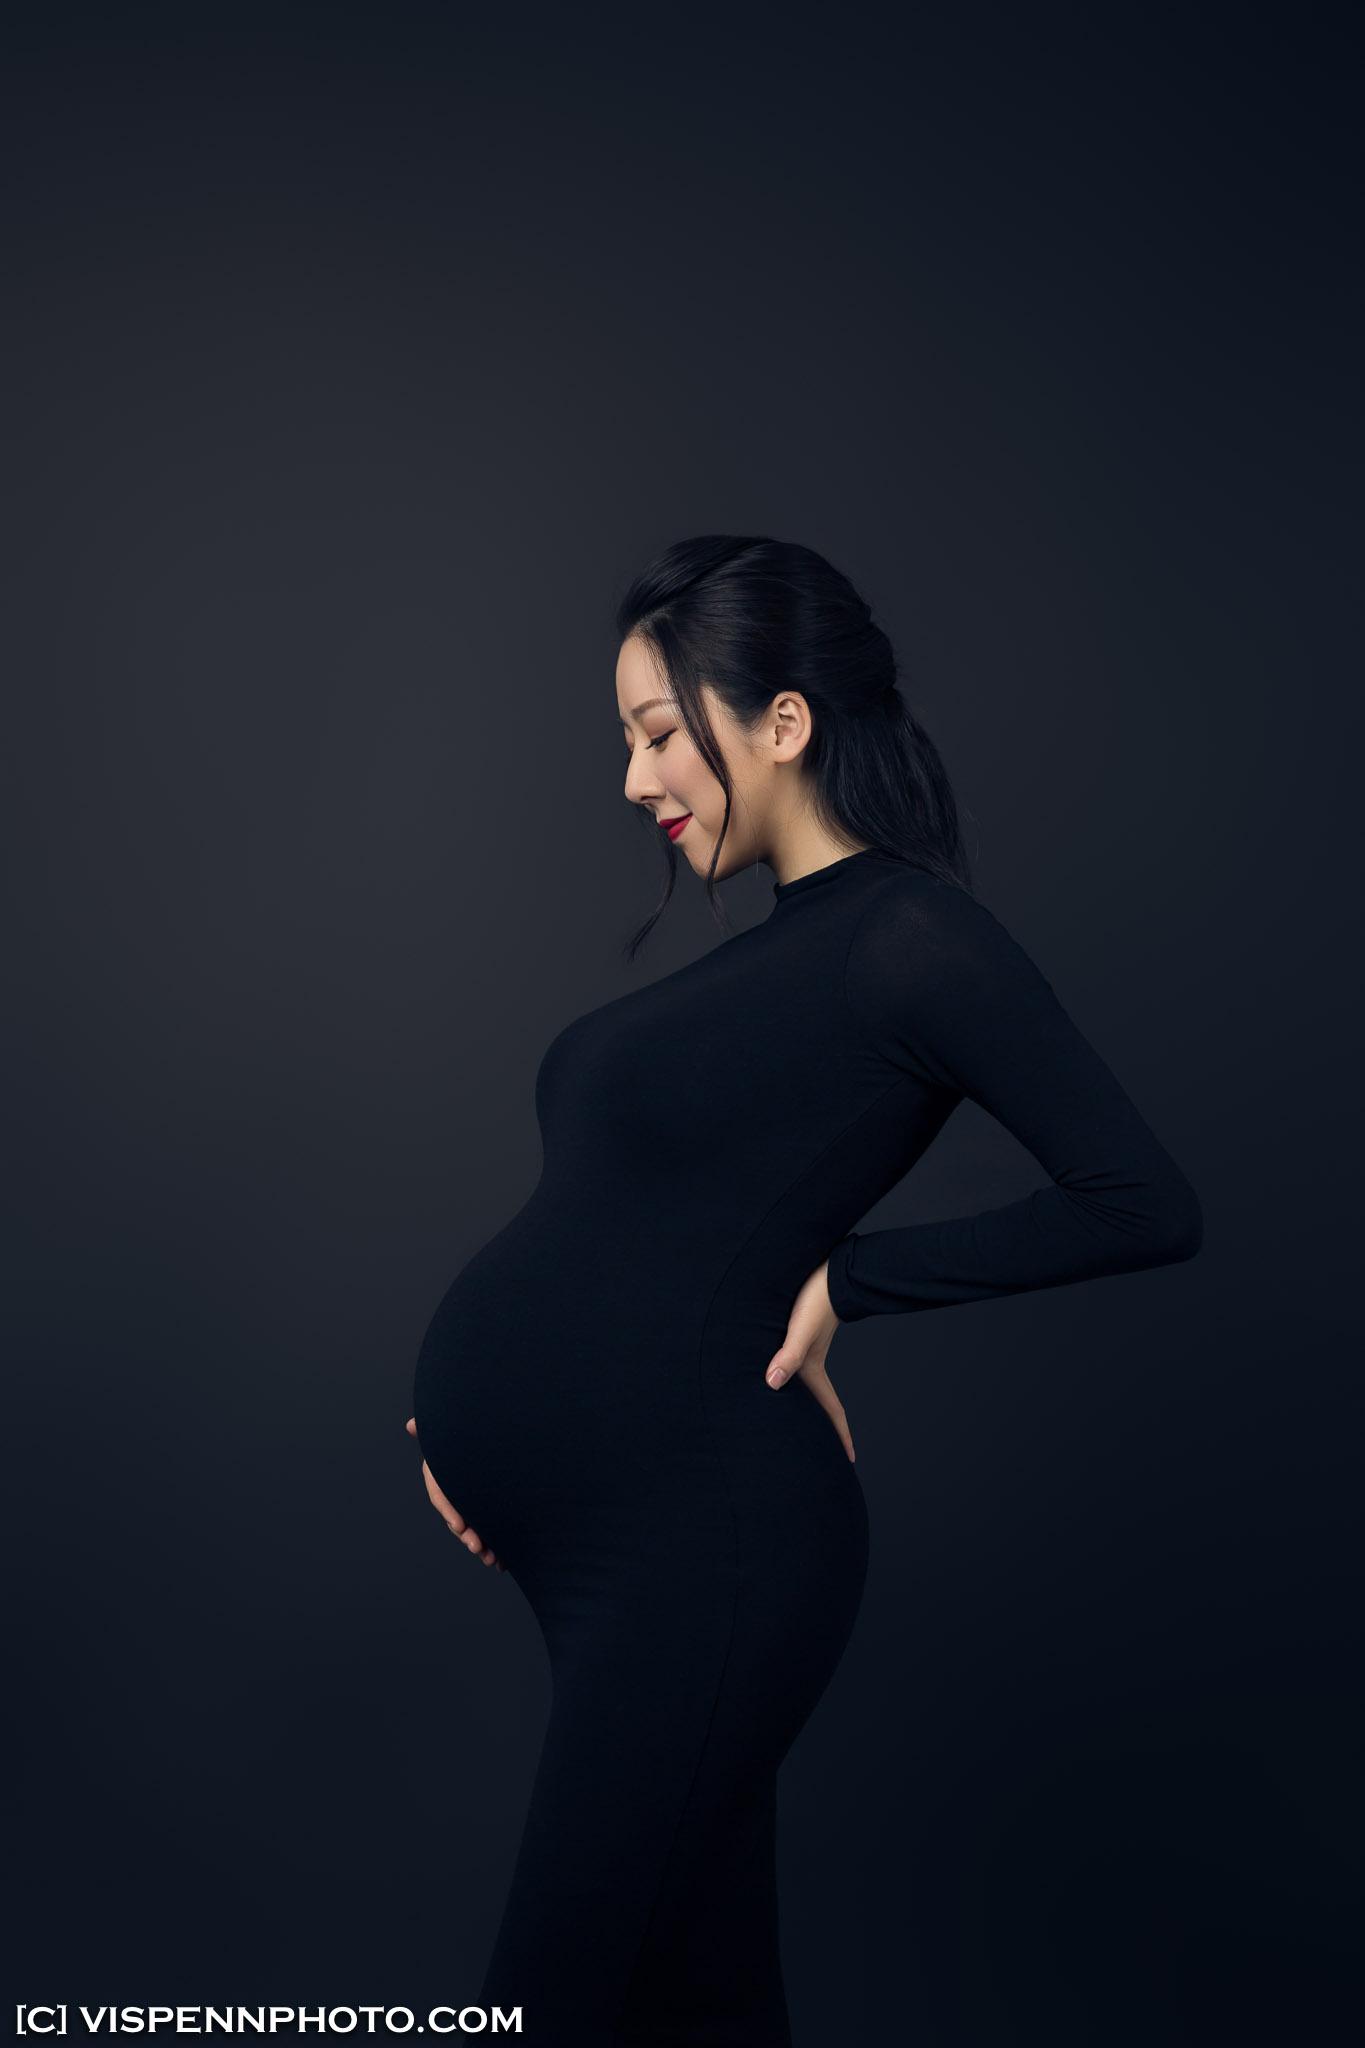 Melbourne Newborn Baby Maternity Family Photo VISPENN 墨尔本 孕妇照 大肚照 Lisha 2136 VISPENN